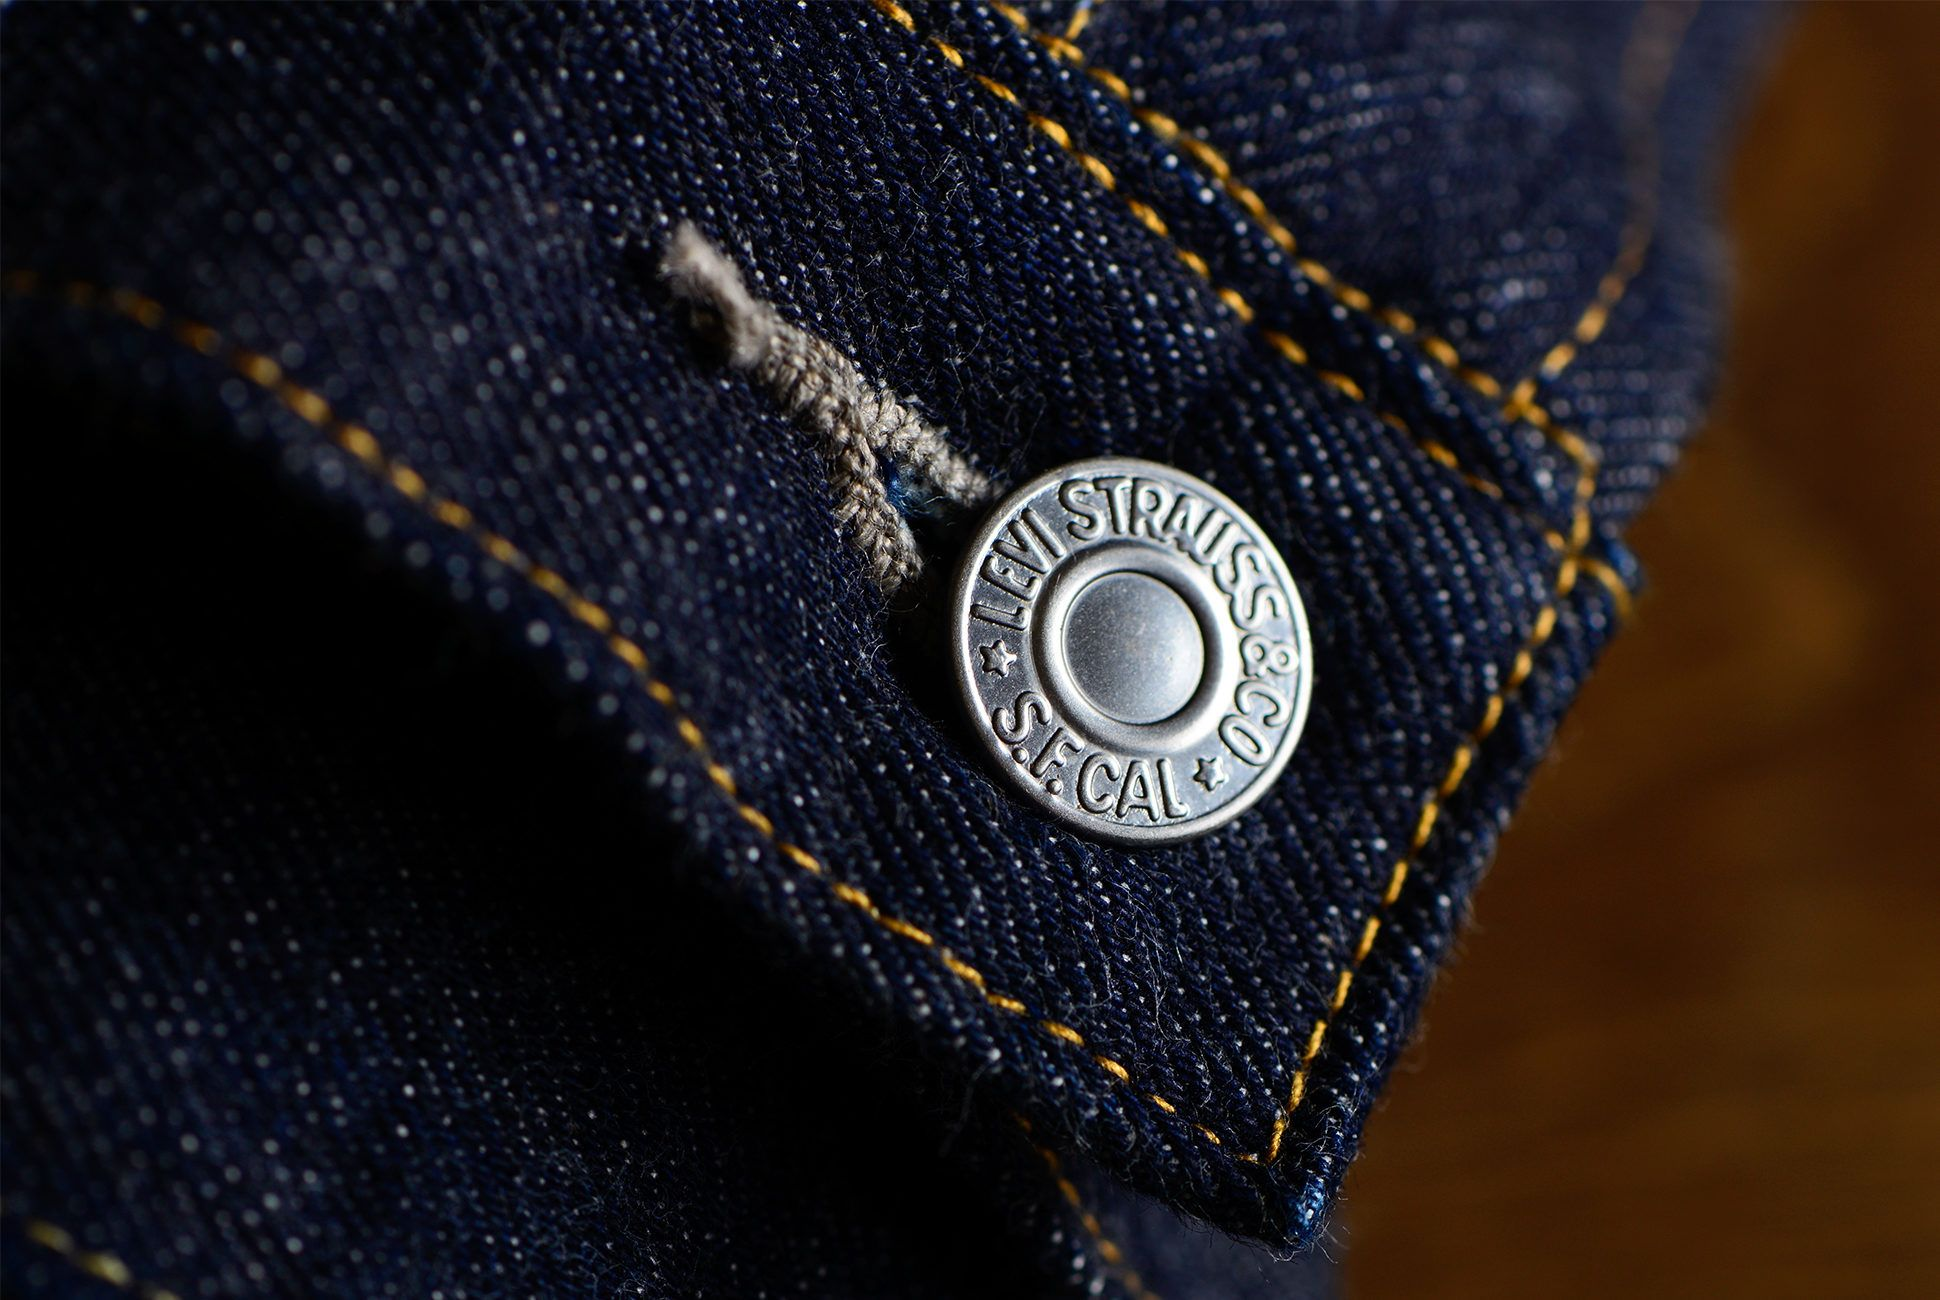 quality-jeans-gear-patrol-970-4